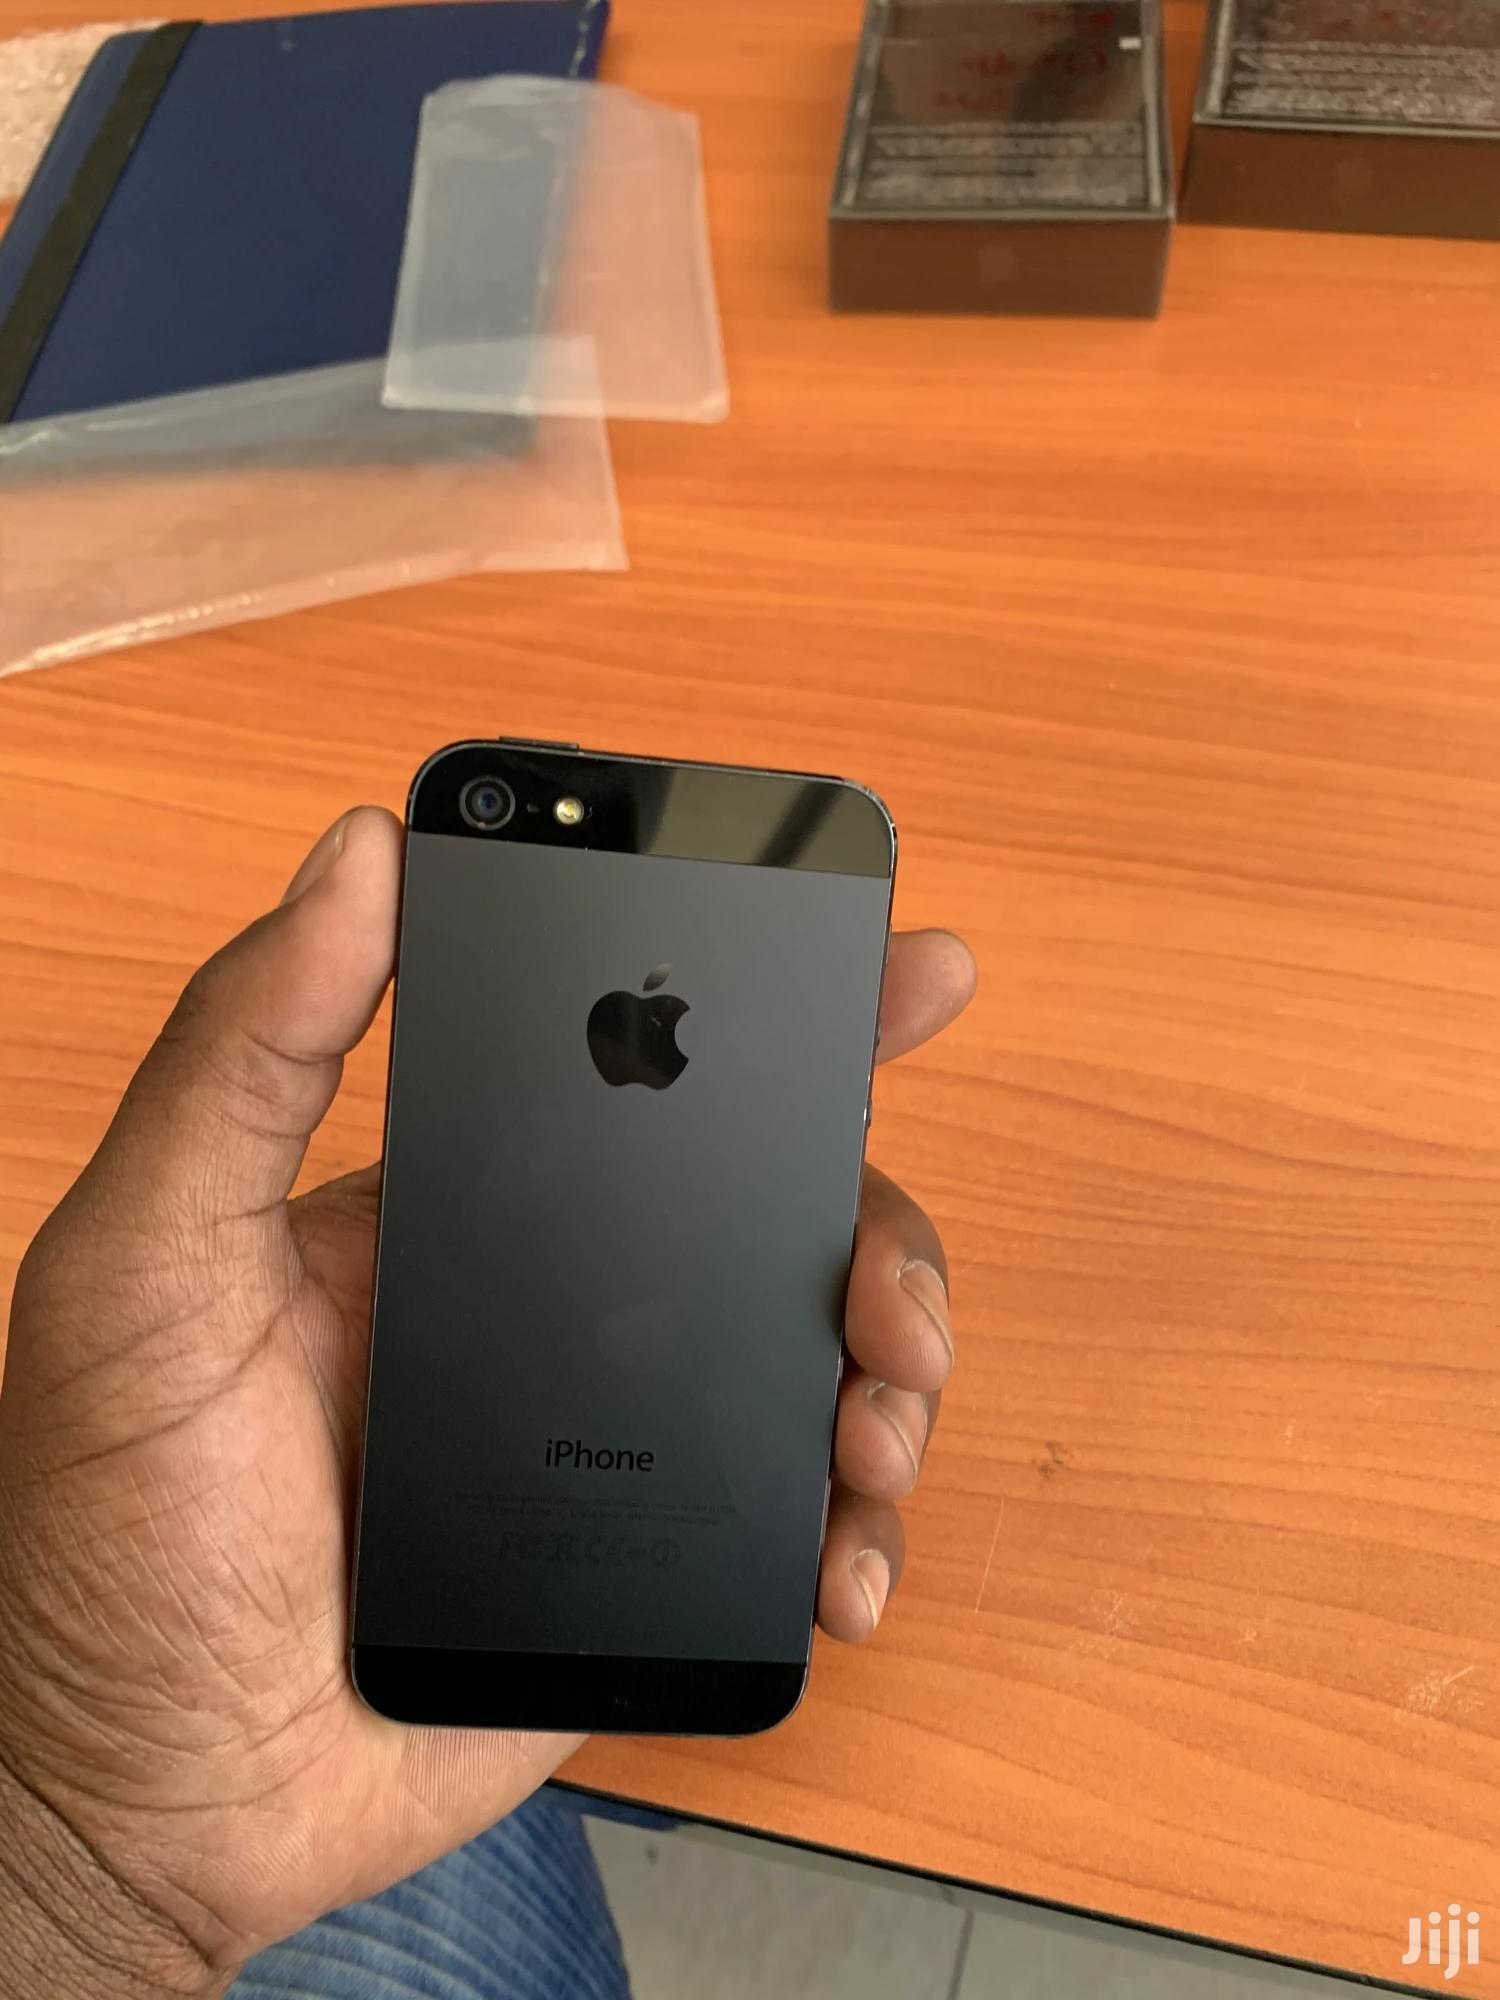 Apple iPhone 5 32 GB Gray | Mobile Phones for sale in Nairobi Central, Nairobi, Kenya